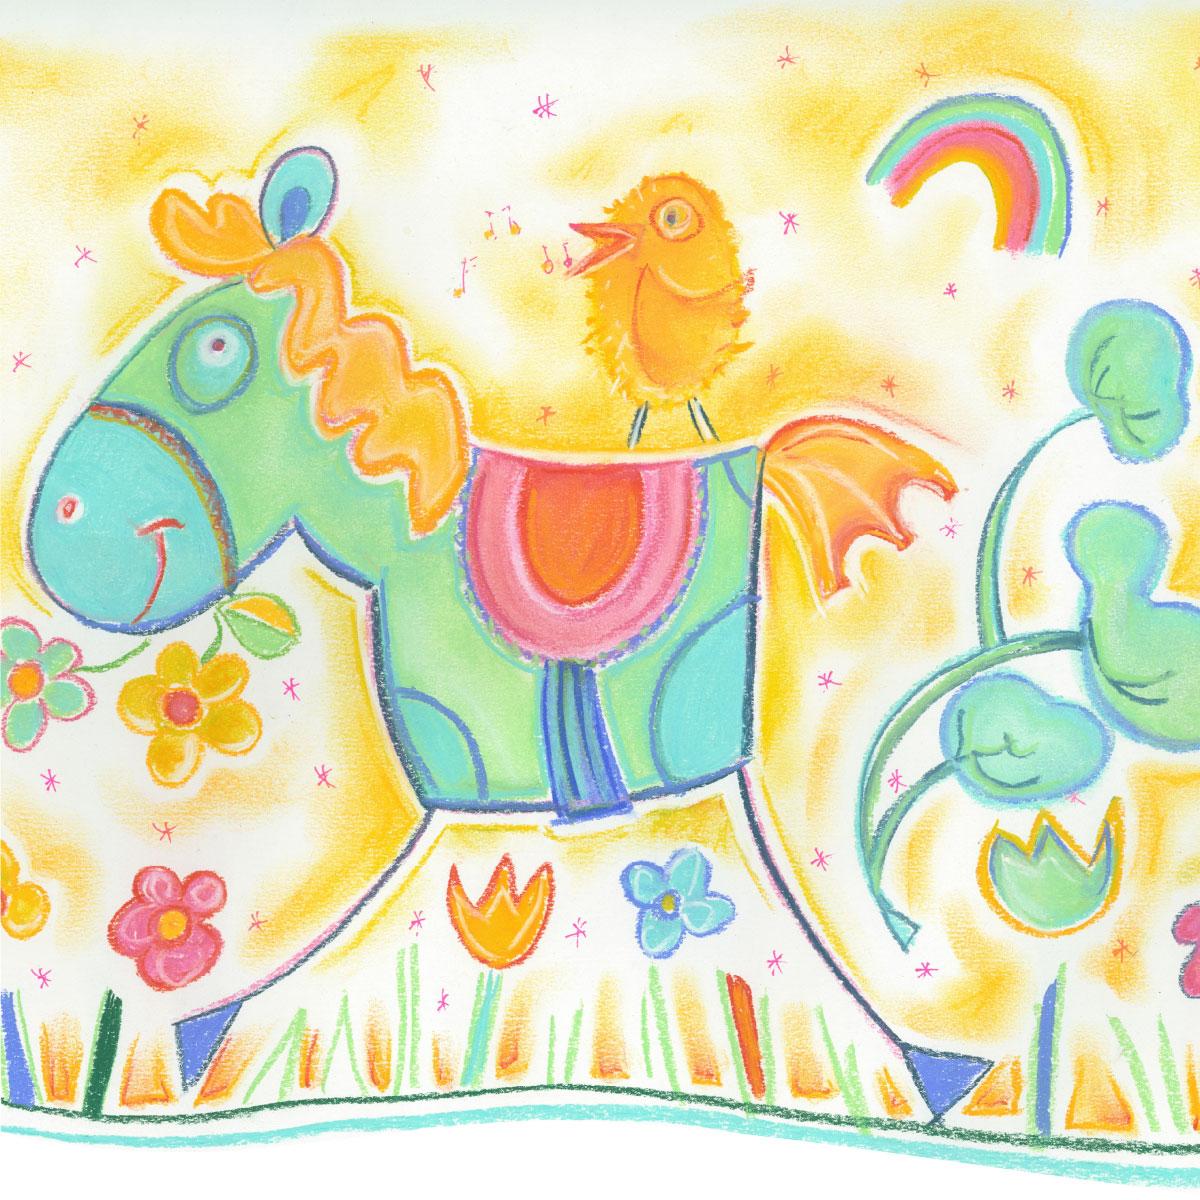 nicola-gibbs-arty-card-little-horse.jpg